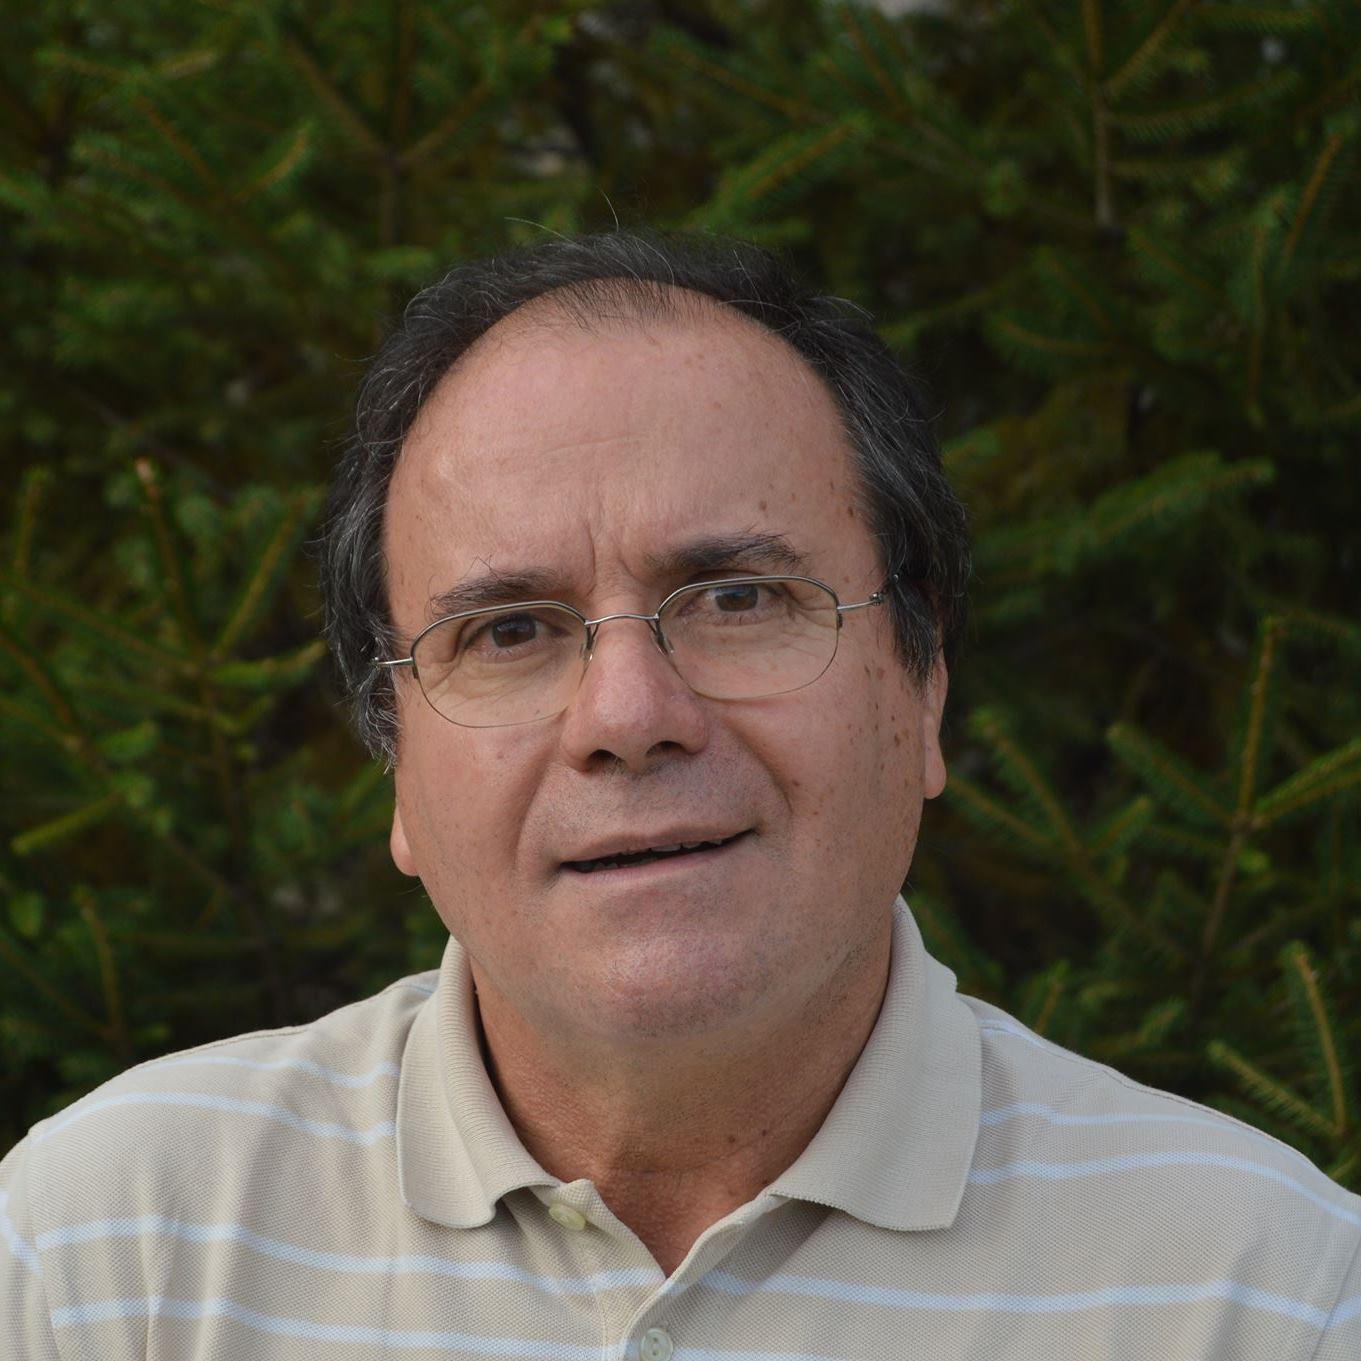 Manuel Vitorino